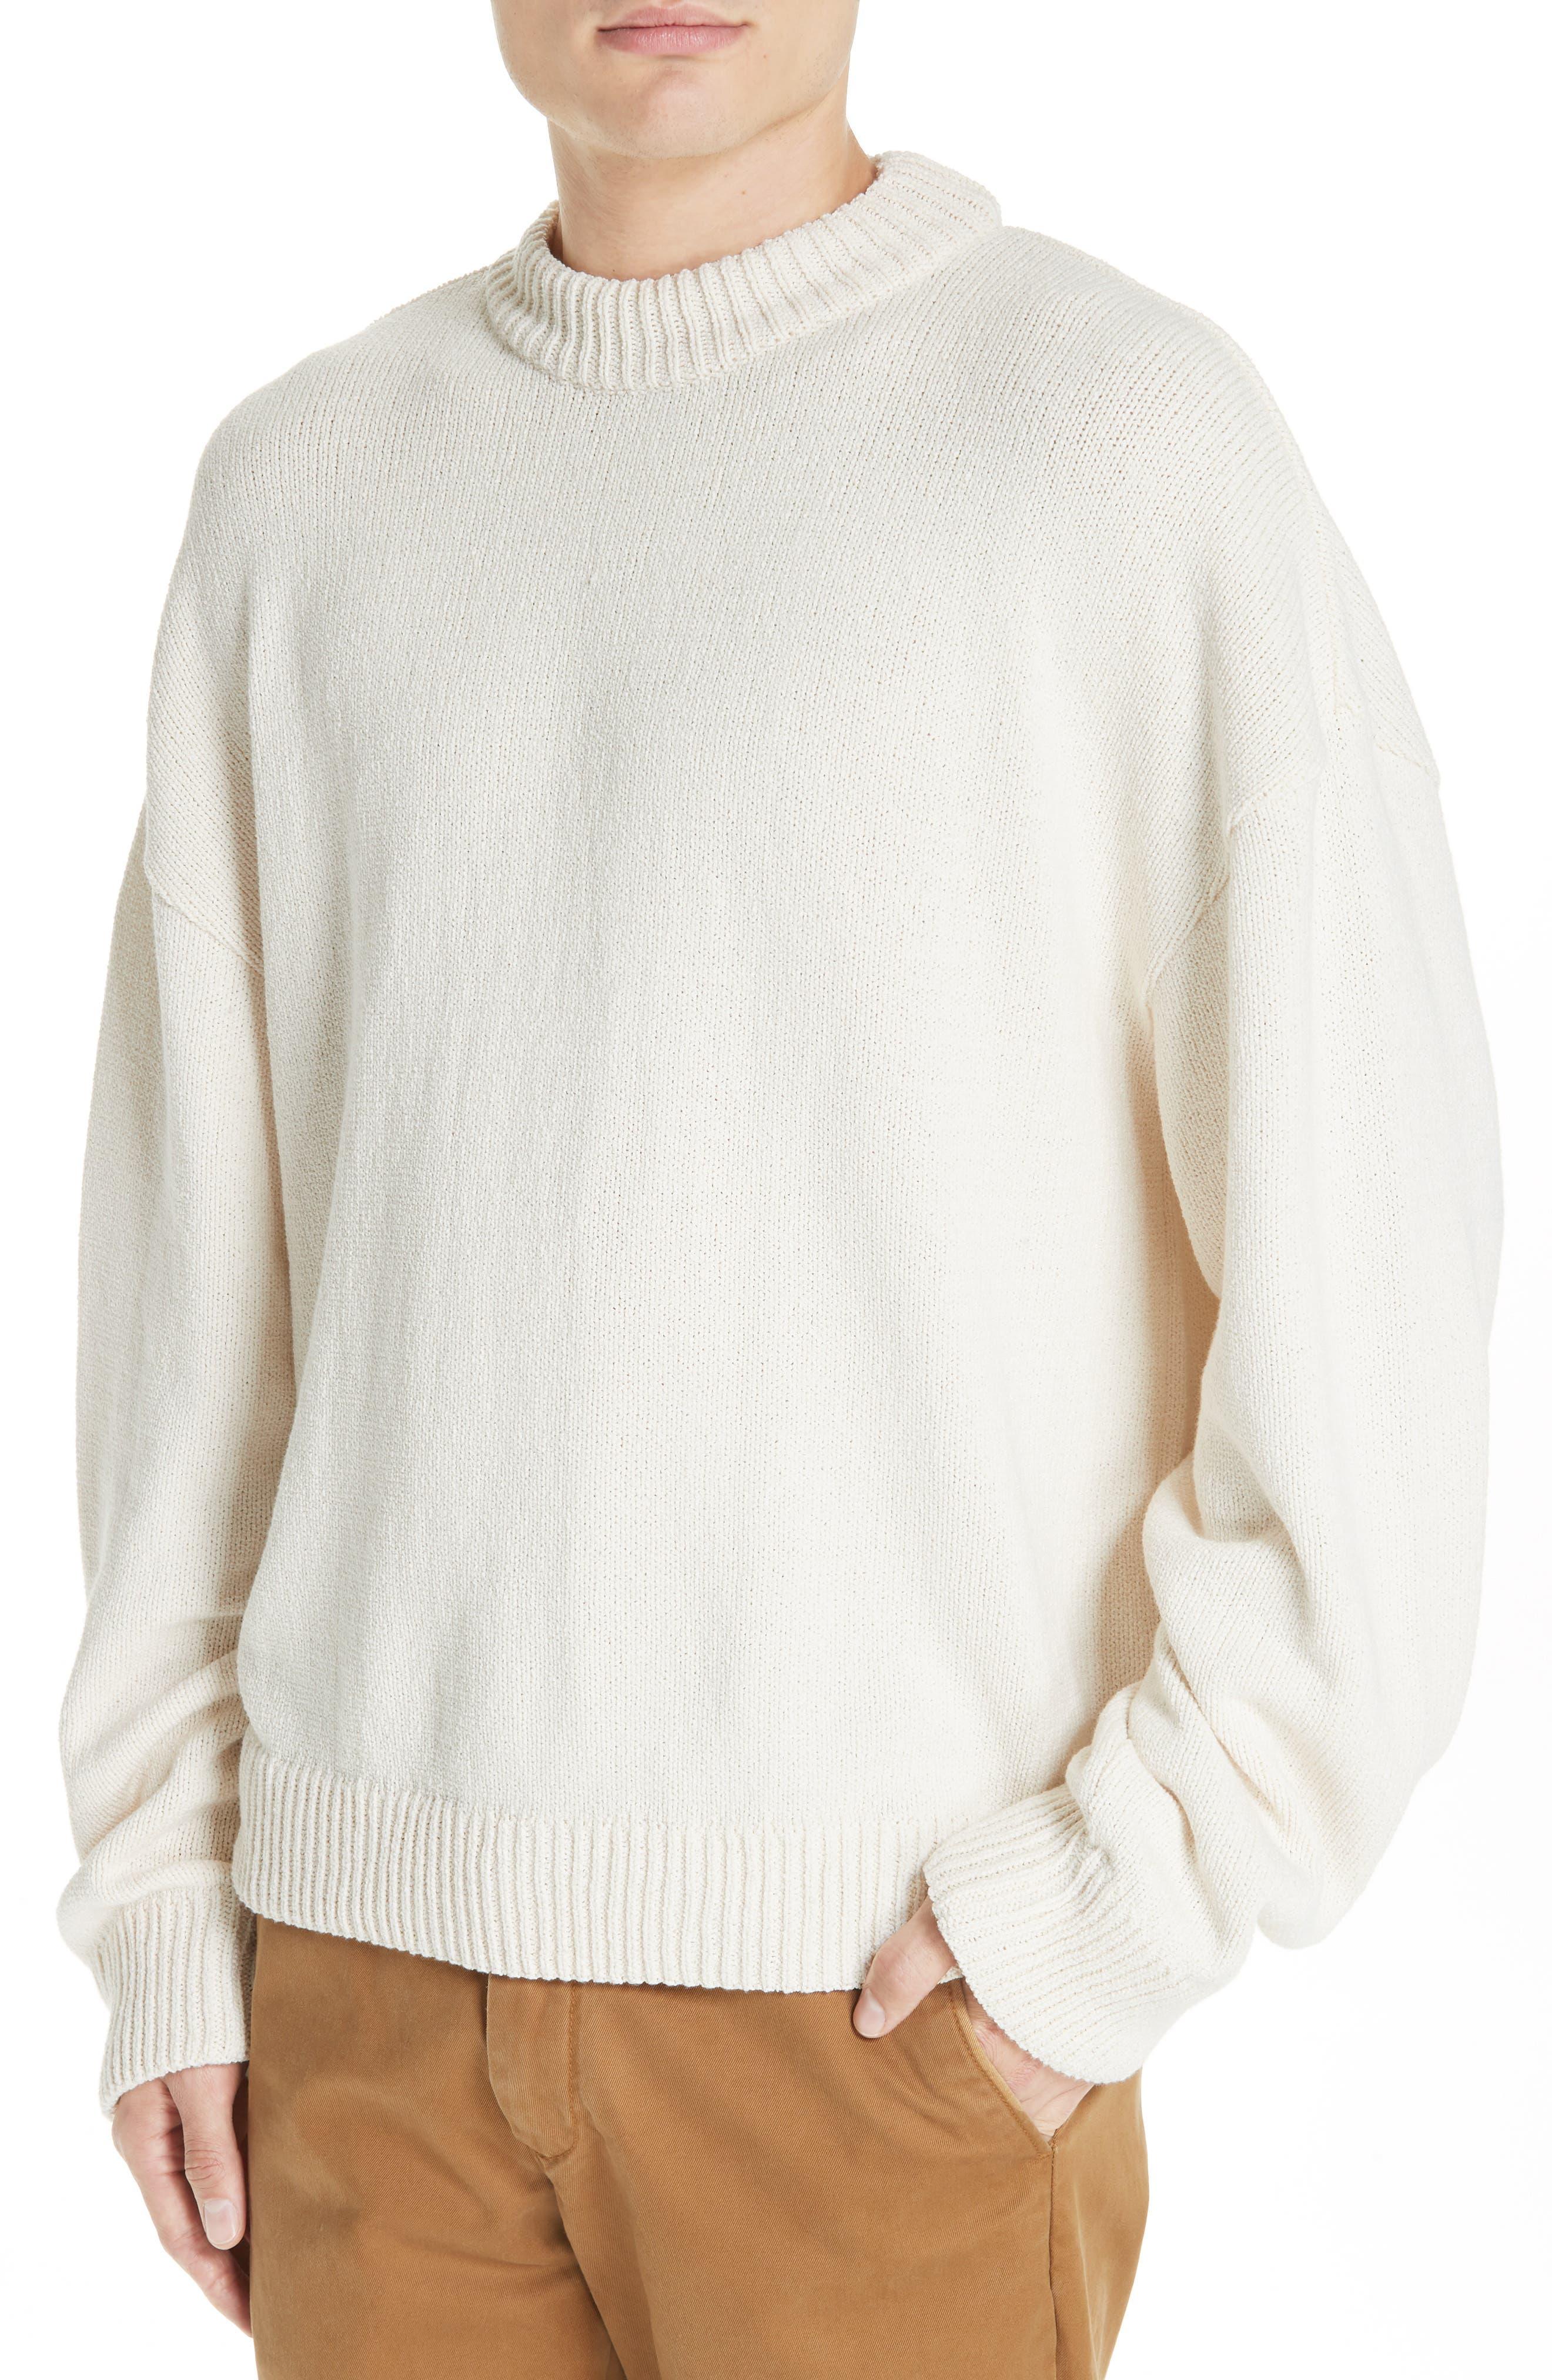 Somar Oversized Crewneck Sweater,                             Alternate thumbnail 4, color,                             100